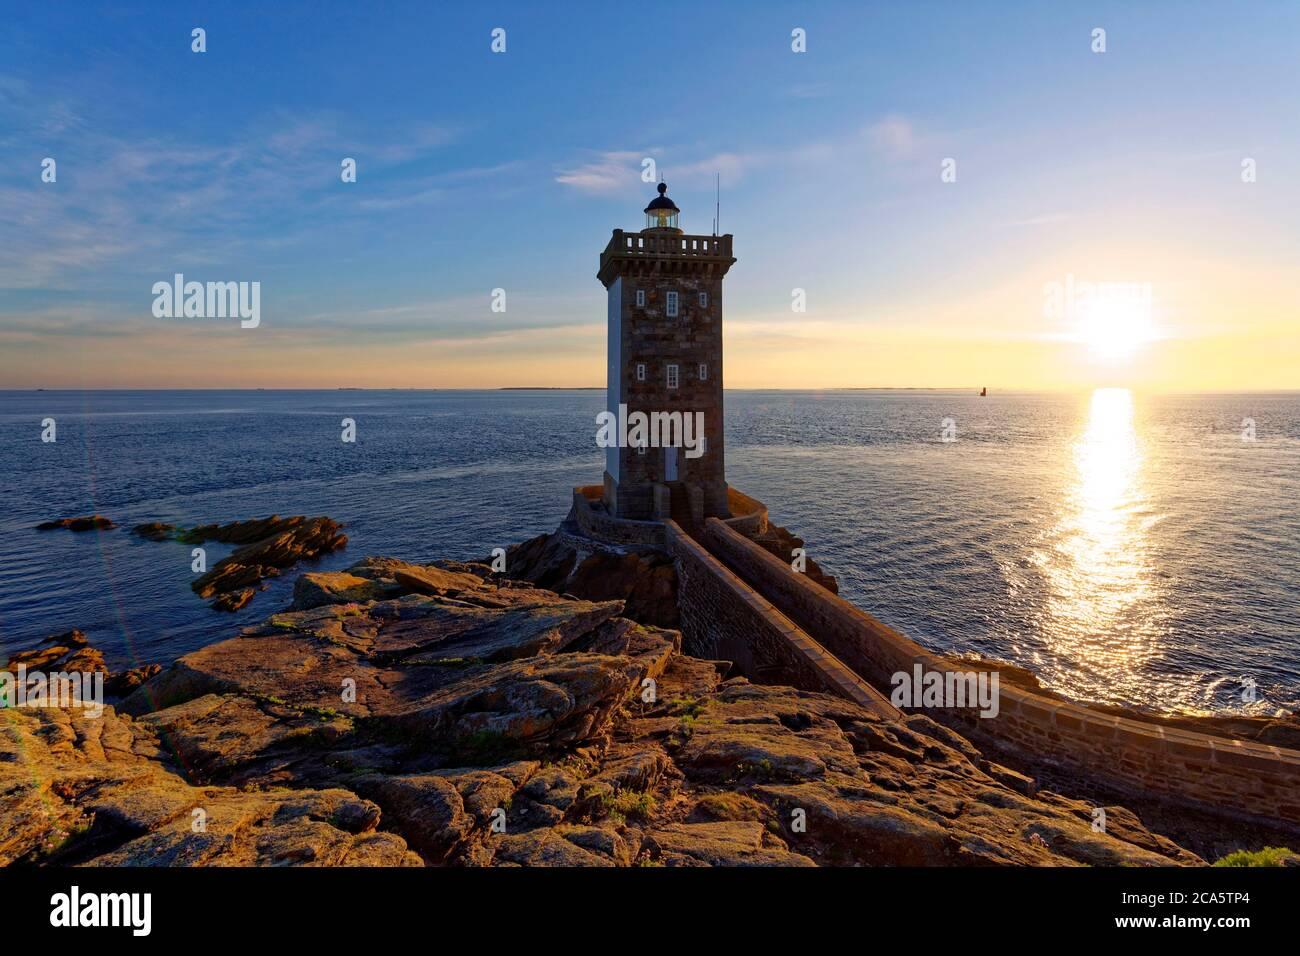 France, Finistere, Iroise see, Armorique Regional natural park, Le Conquet, Kermorvan peninsula, Pointe de Kermorvan and Kermorvan lighthouse Stock Photo